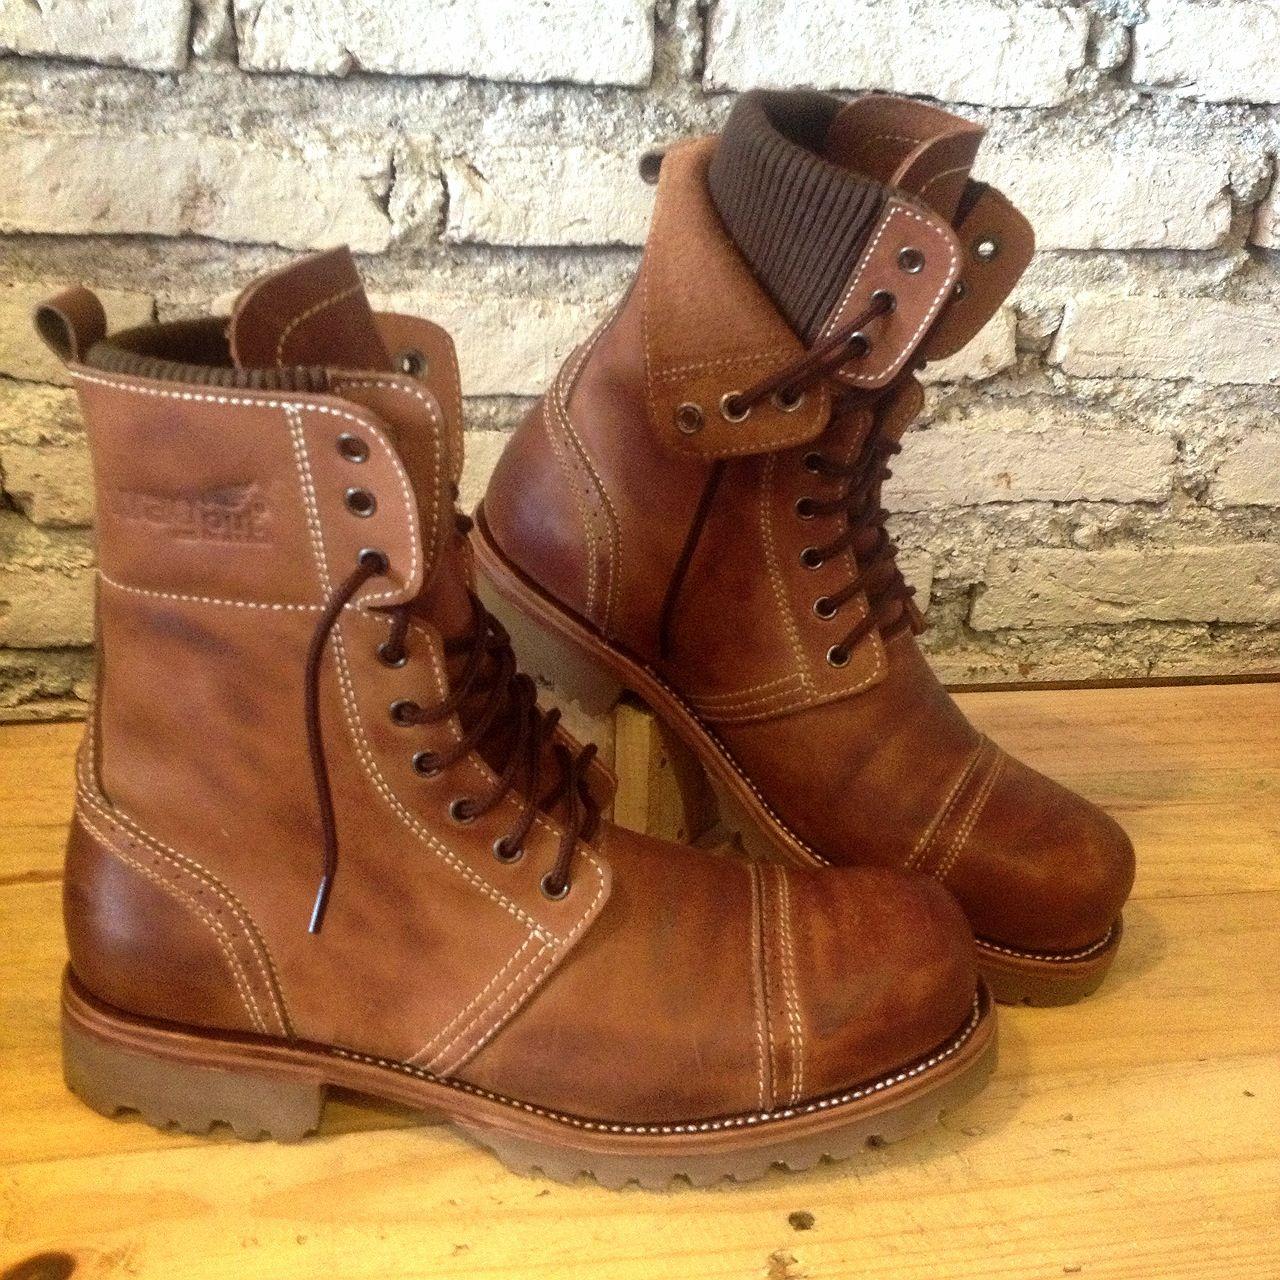 Botas de avestruz color gris ropa bolsas y calzado en mercadolibre - Just Got One Loving It Botaszapatostrabajocalzado Ni Ascalzado De